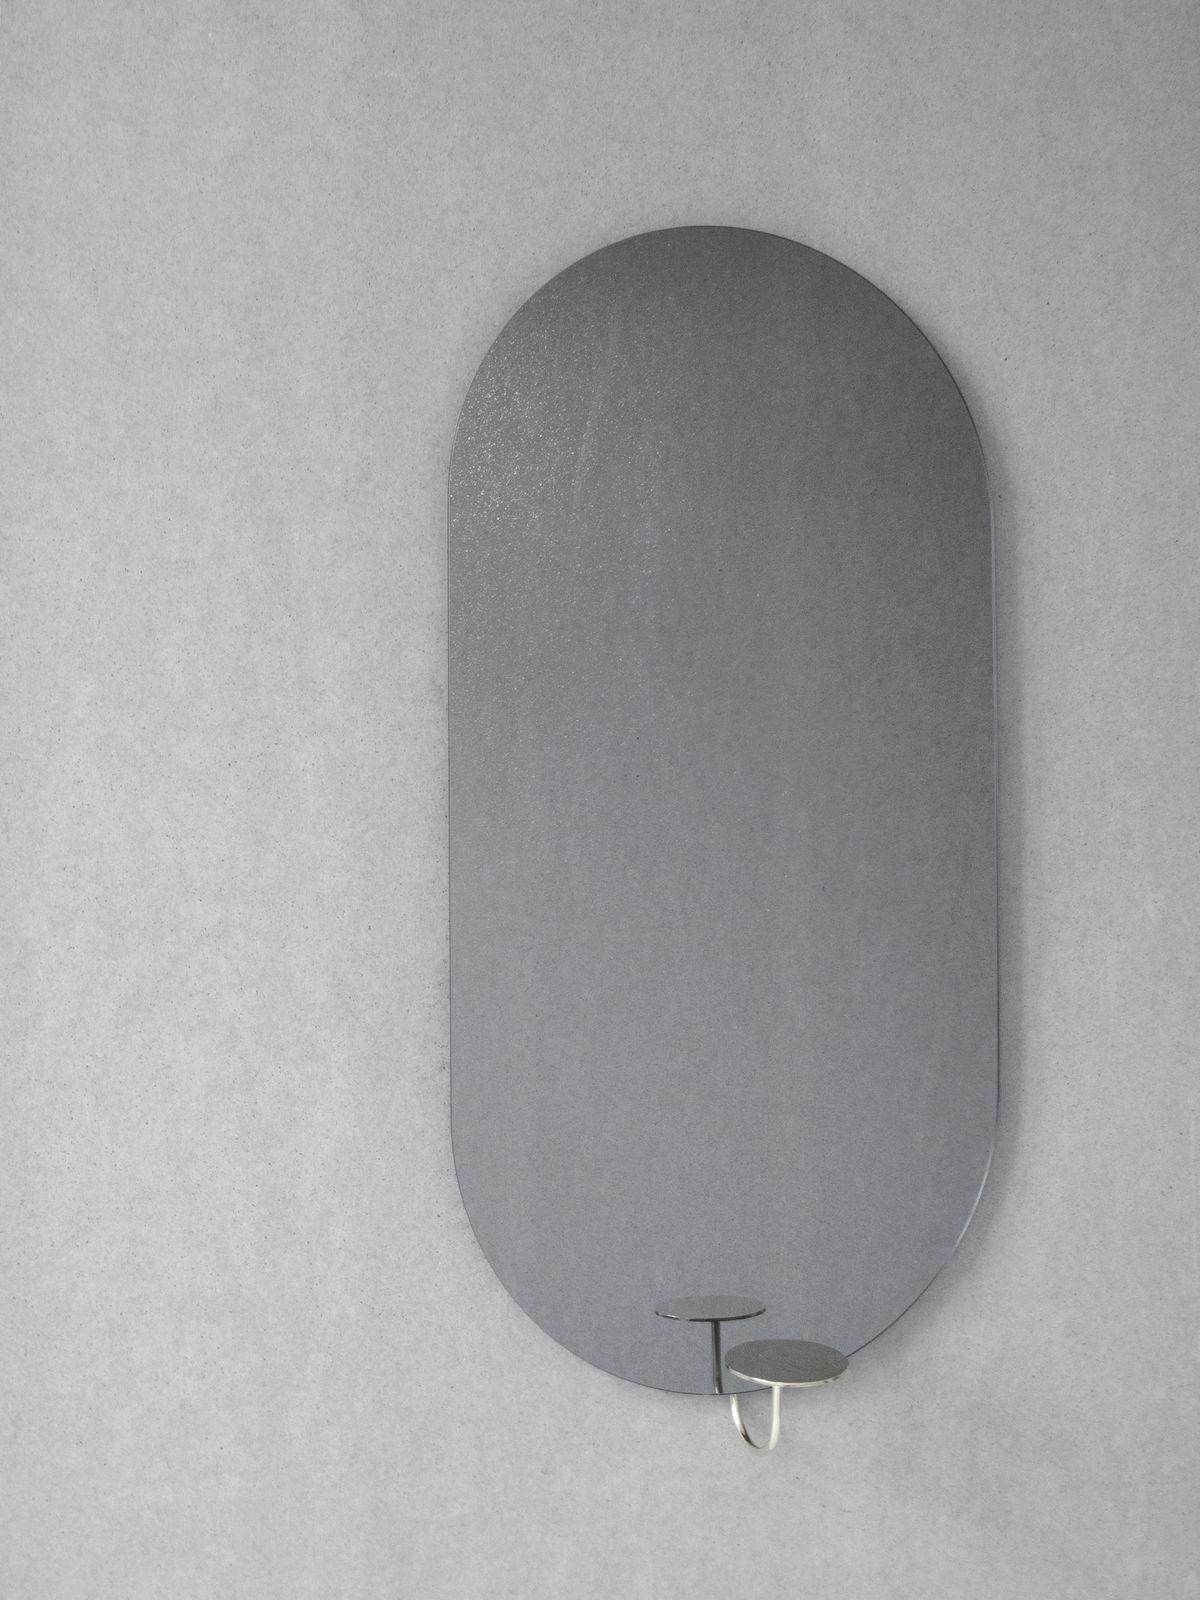 Friends & Founders Miró Miró Mirror - Oval/Grey Mist